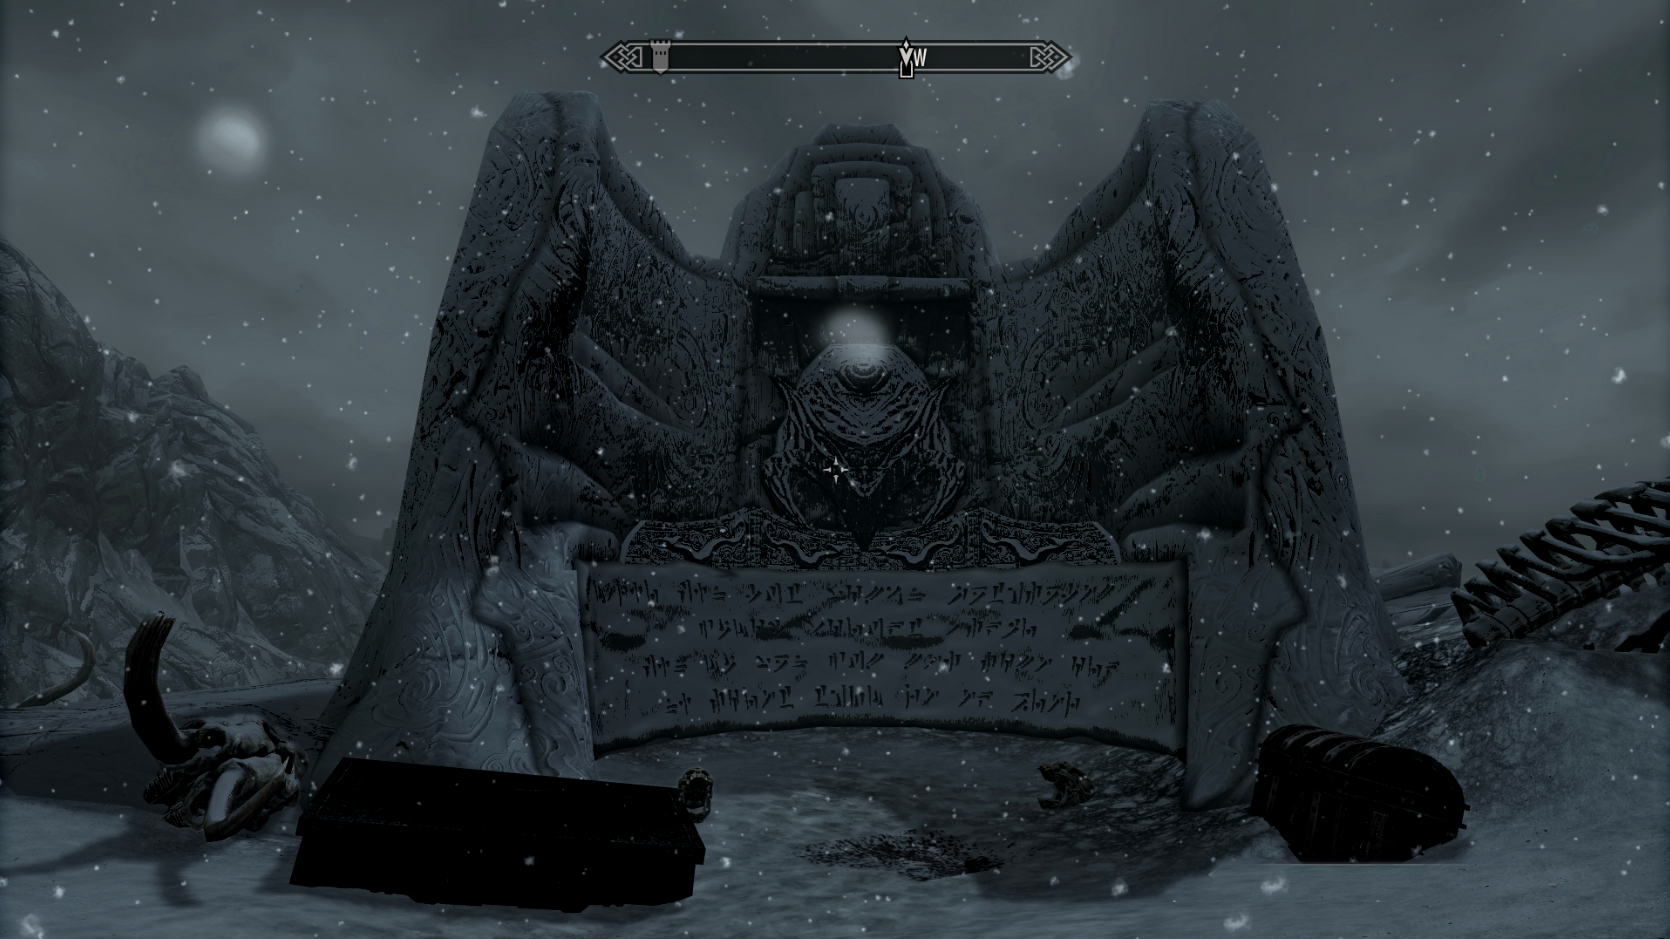 Kategorie:Skyrim: Drachenhorte | Elder Scrolls Wiki | FANDOM